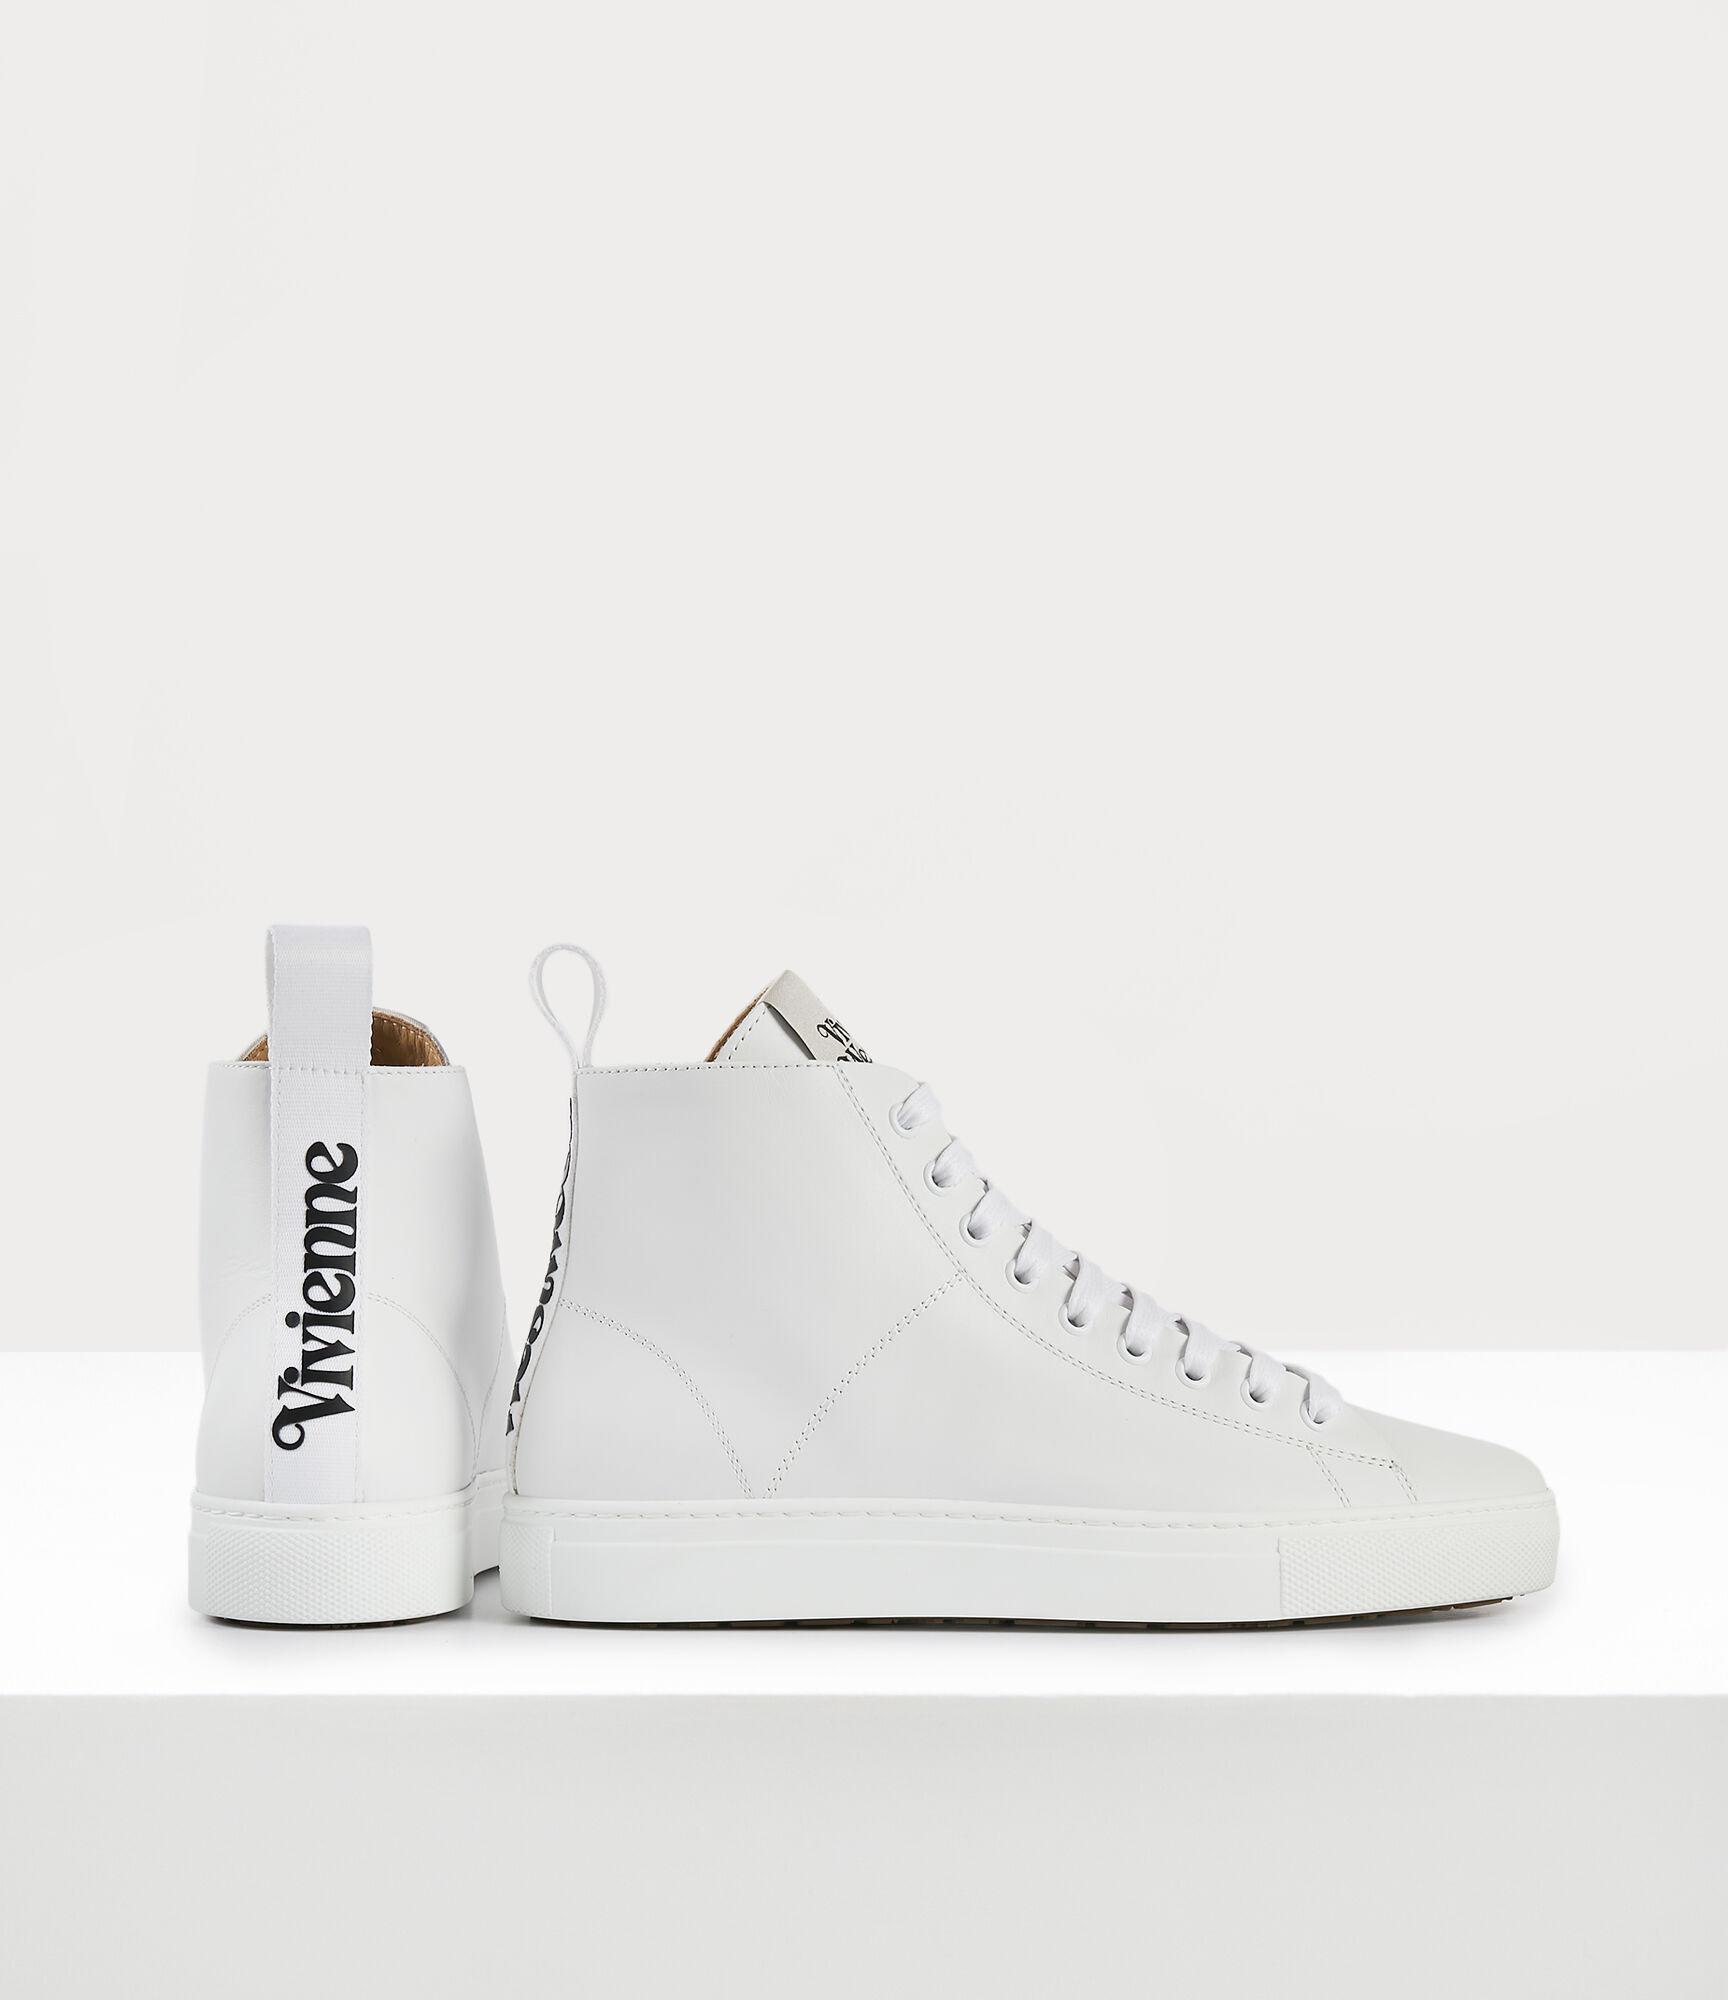 Vivienne Westwood Shoes | Trainers